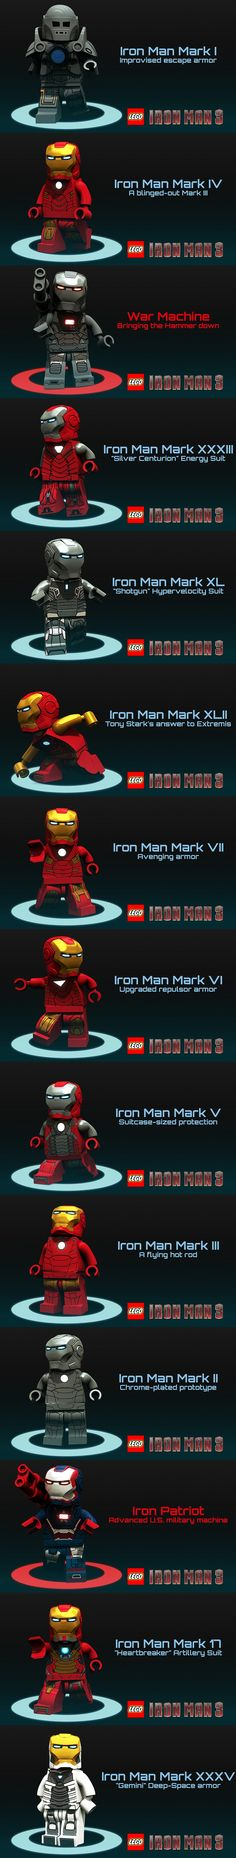 Iron Man suits (custom designs renderered in Blender) #LEGO #IronMan #blender